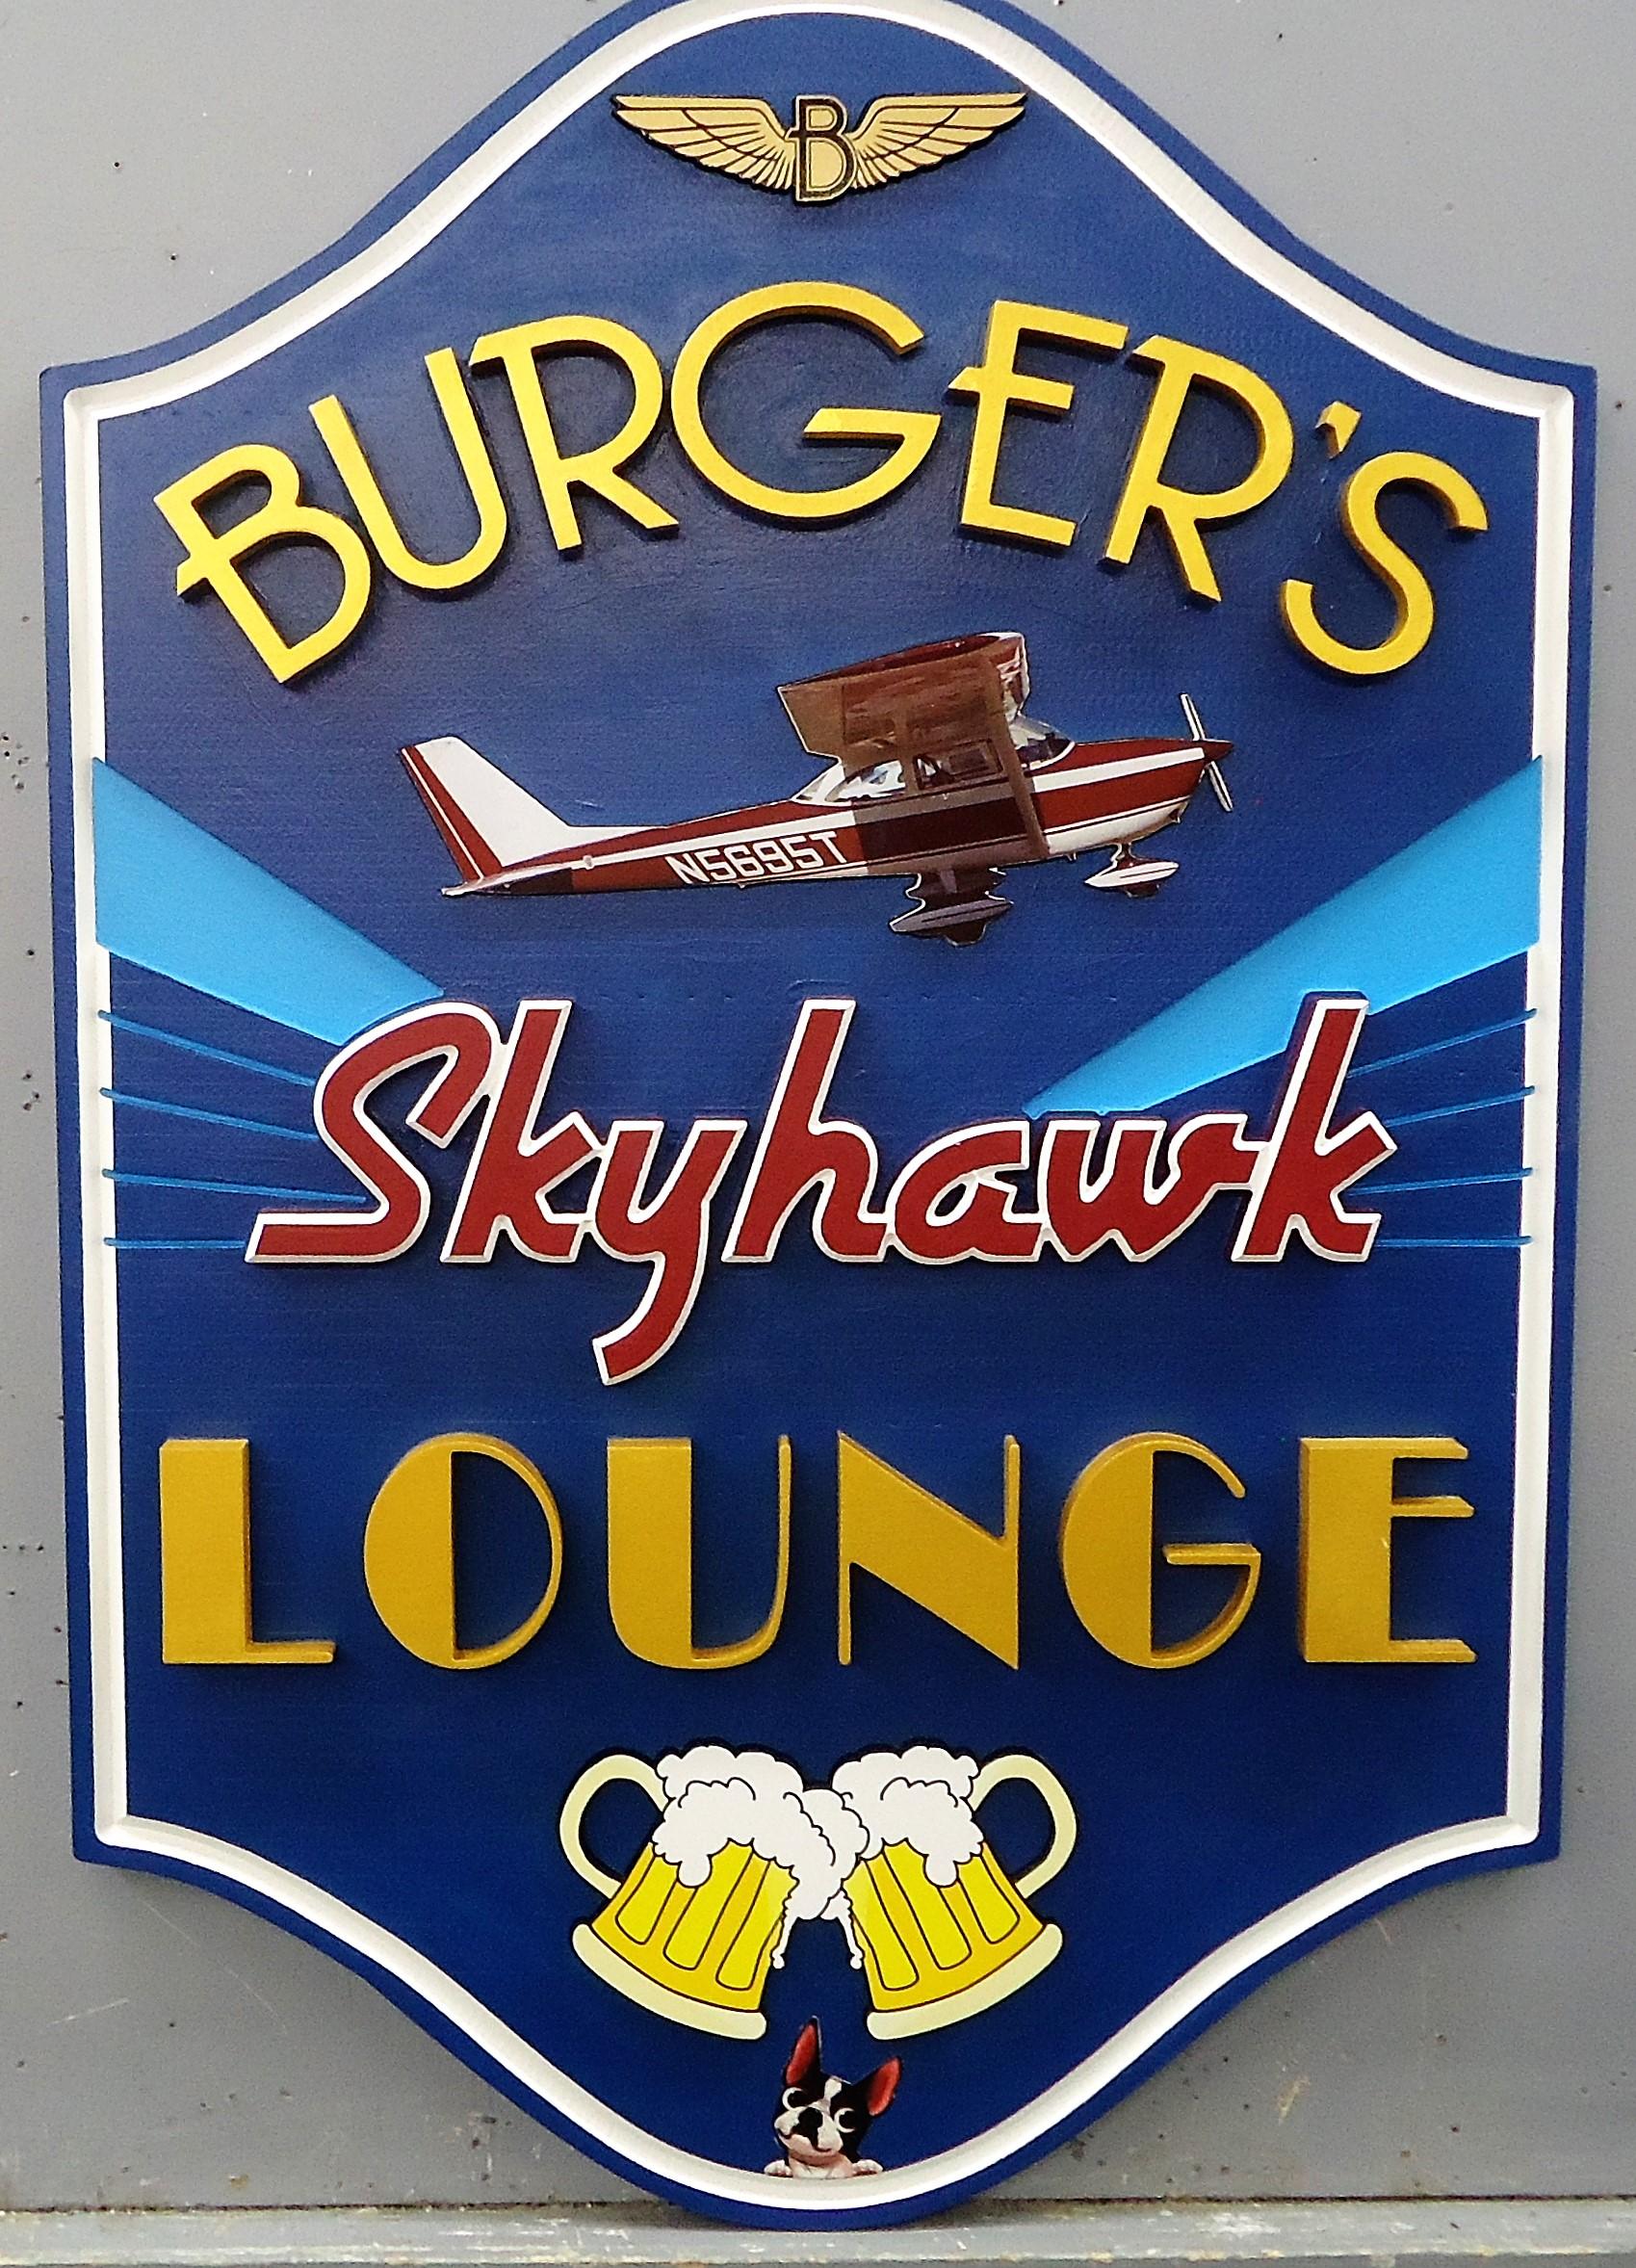 Skyhawks Lounge